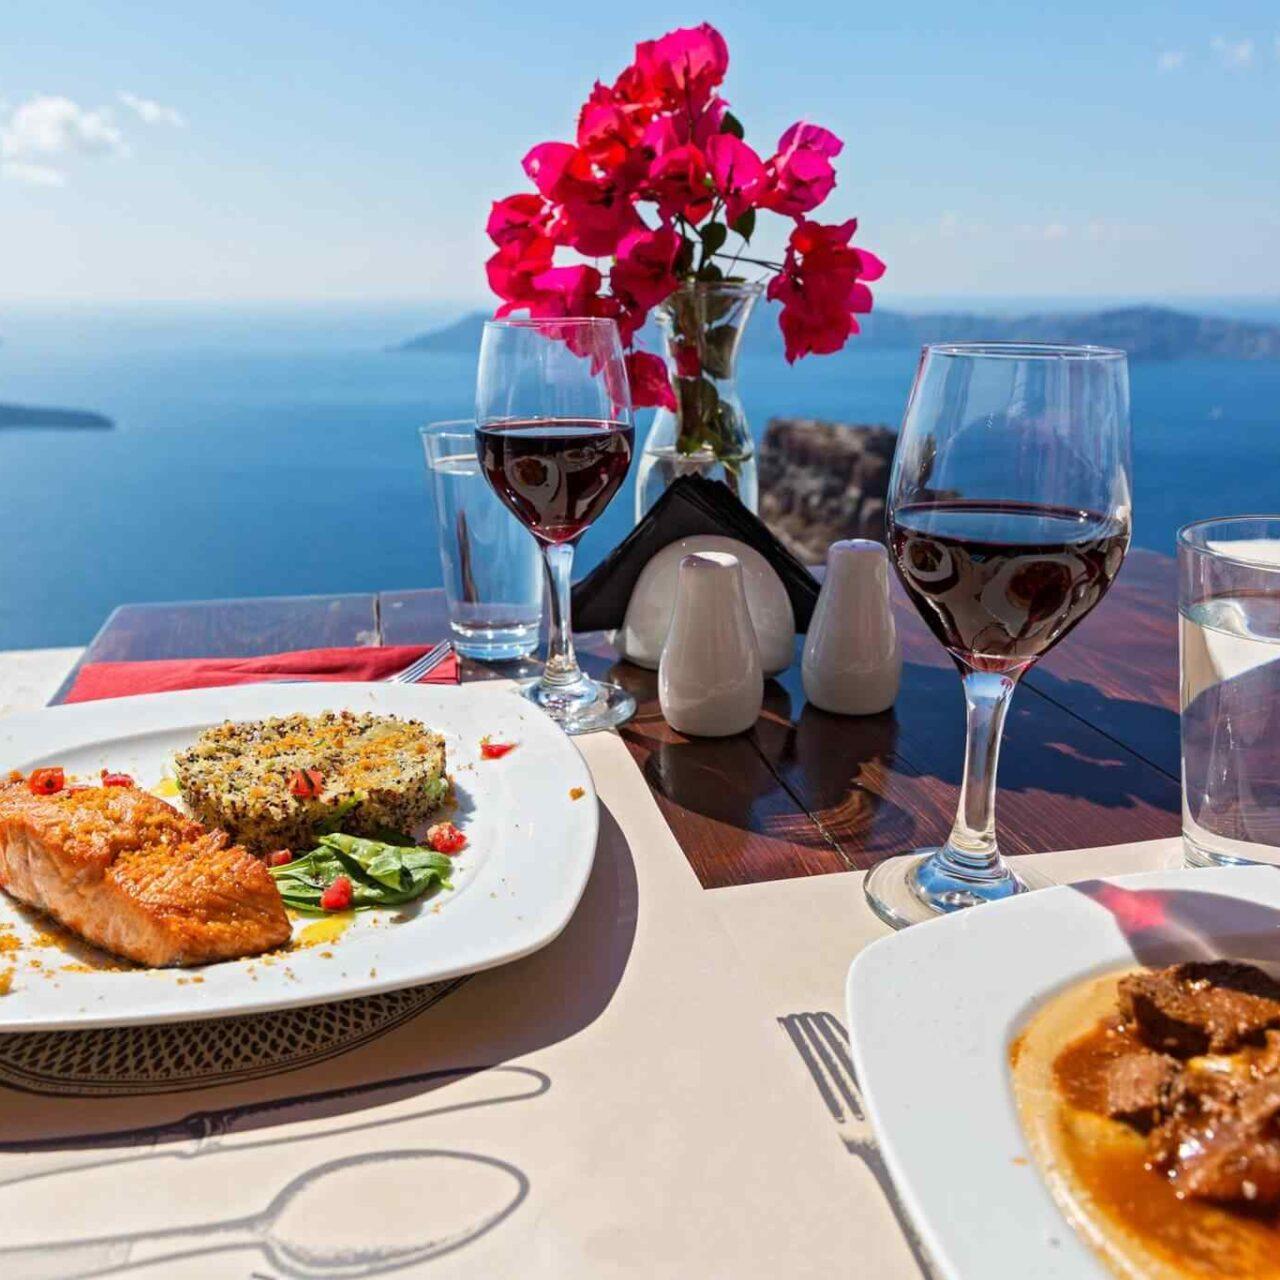 https://bbqterkep.hu/wp-content/uploads/2017/10/restaurant-italian-25-1280x1280.jpg